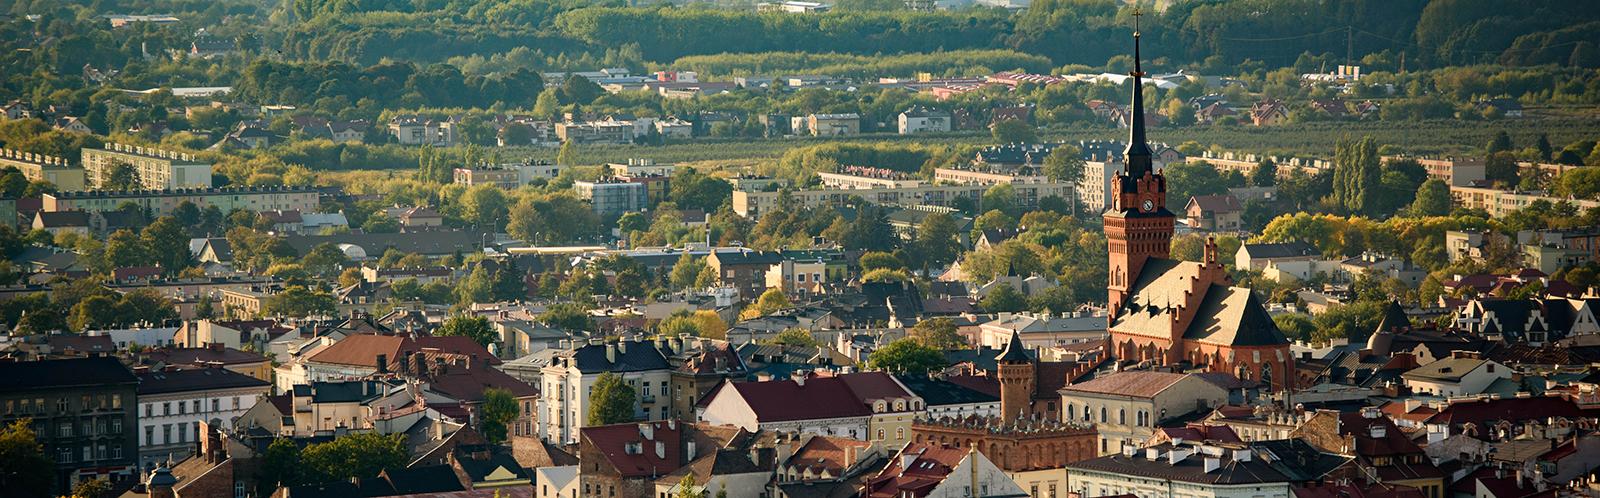 Aglomeracja Tarnowska